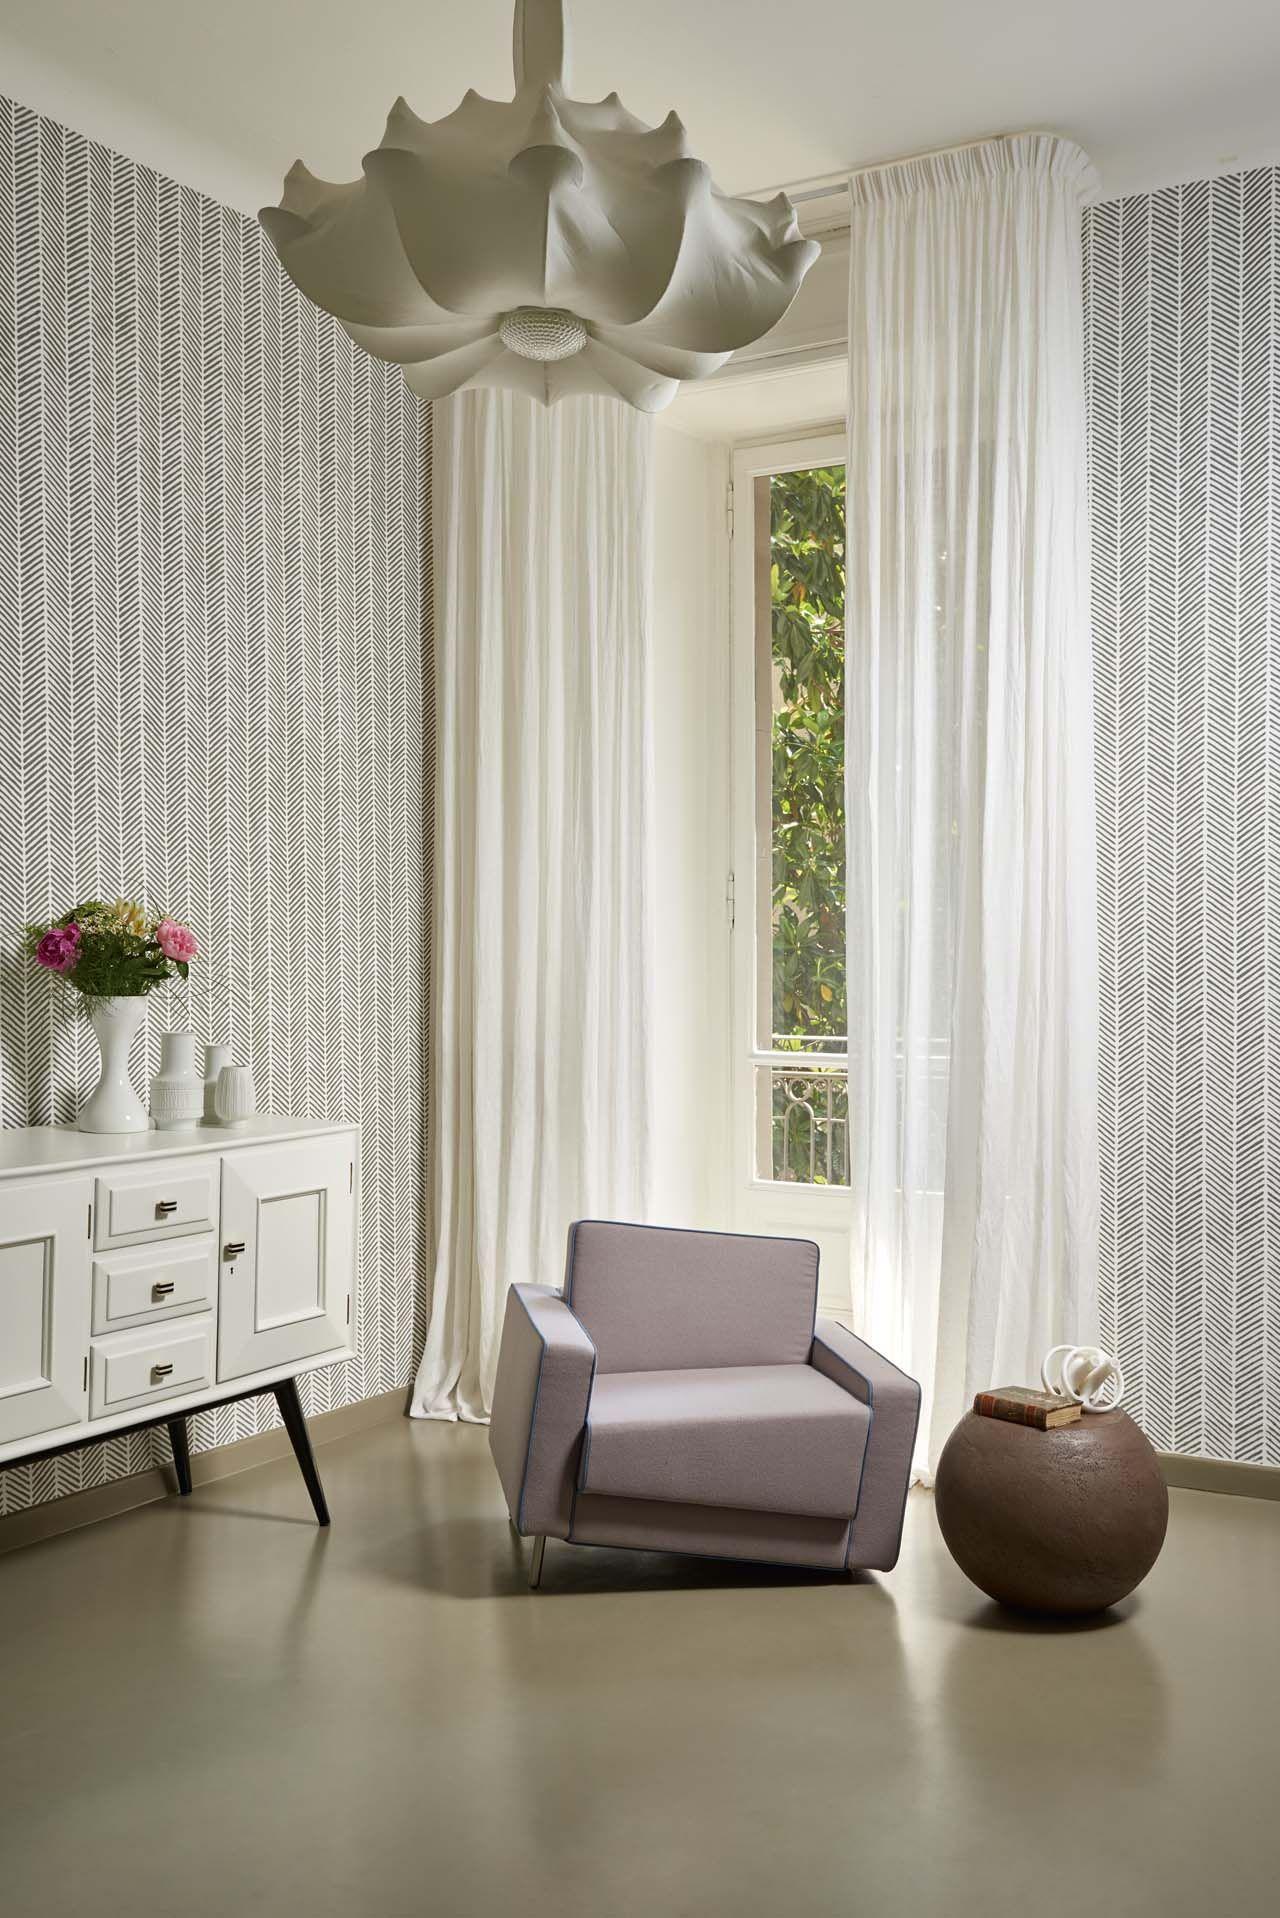 Top 10 Italian Furniture Brands Italian Furniture Italian Furniture Brands Sofa Design